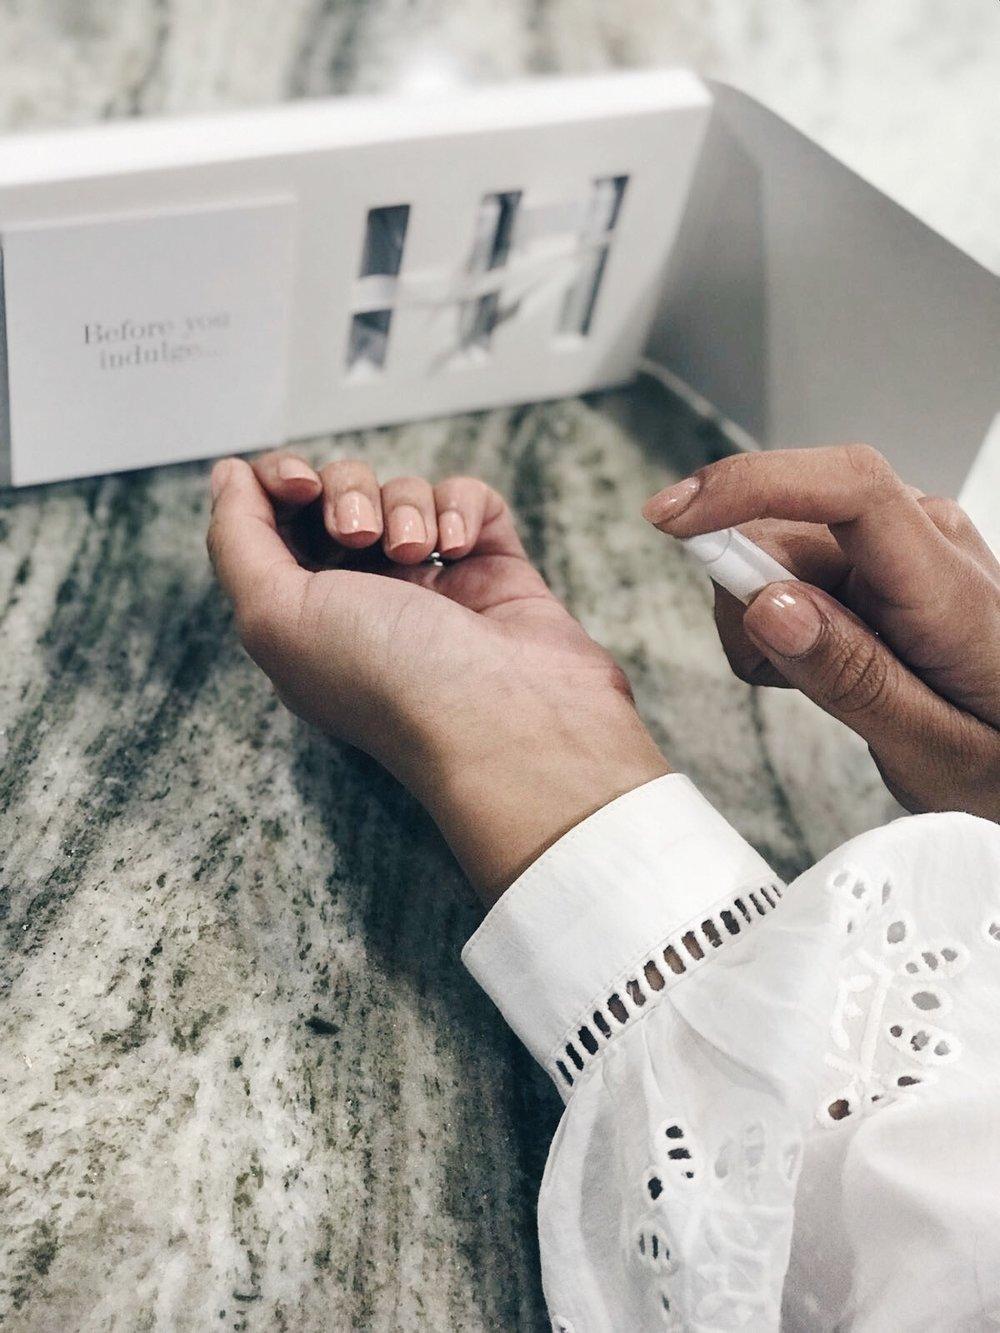 blogger-review-of-PHLUR-fragrances